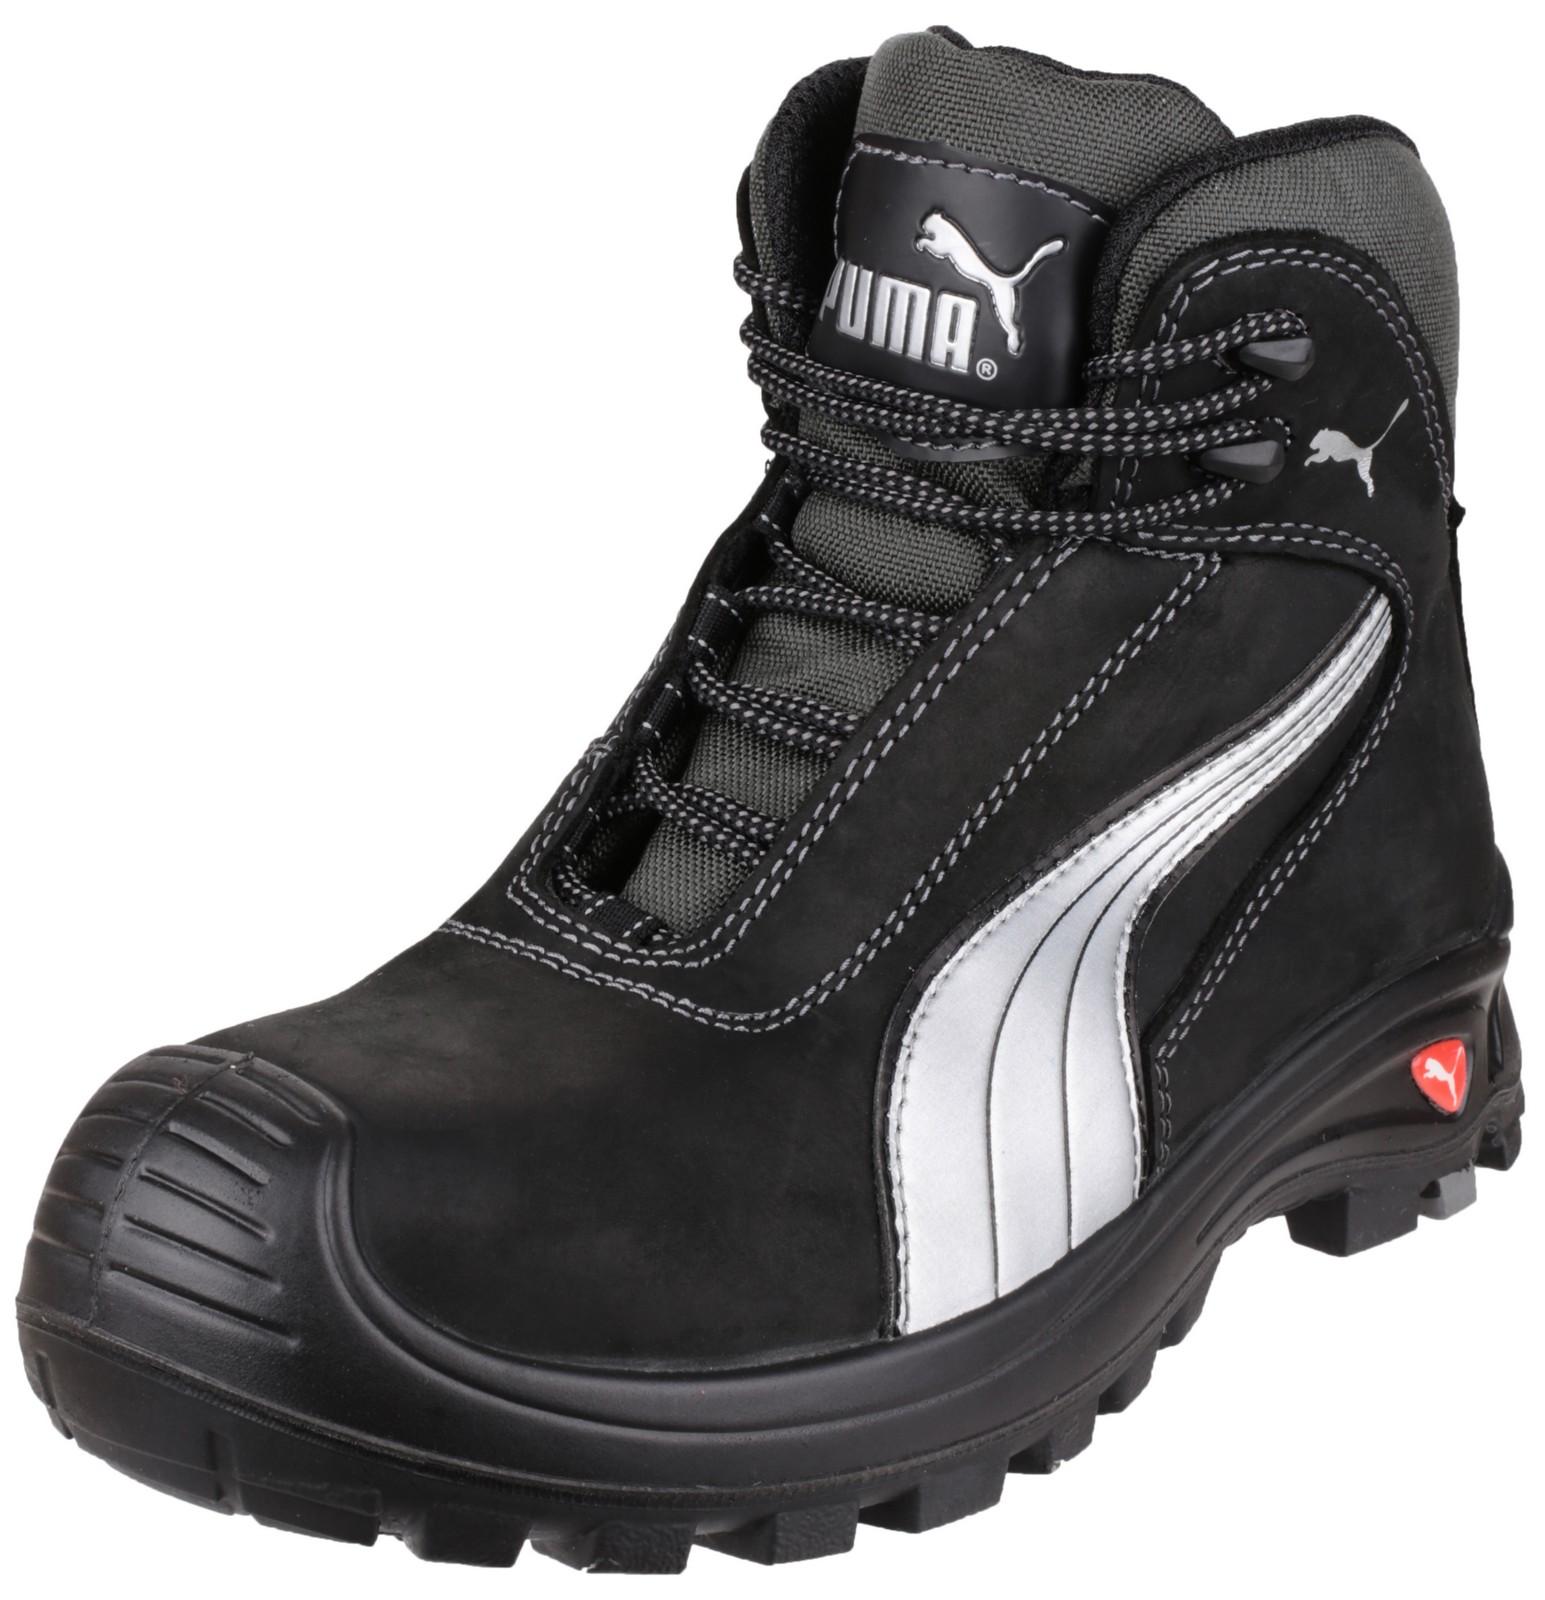 Puma Safety Cascades Safety Boots | EBay